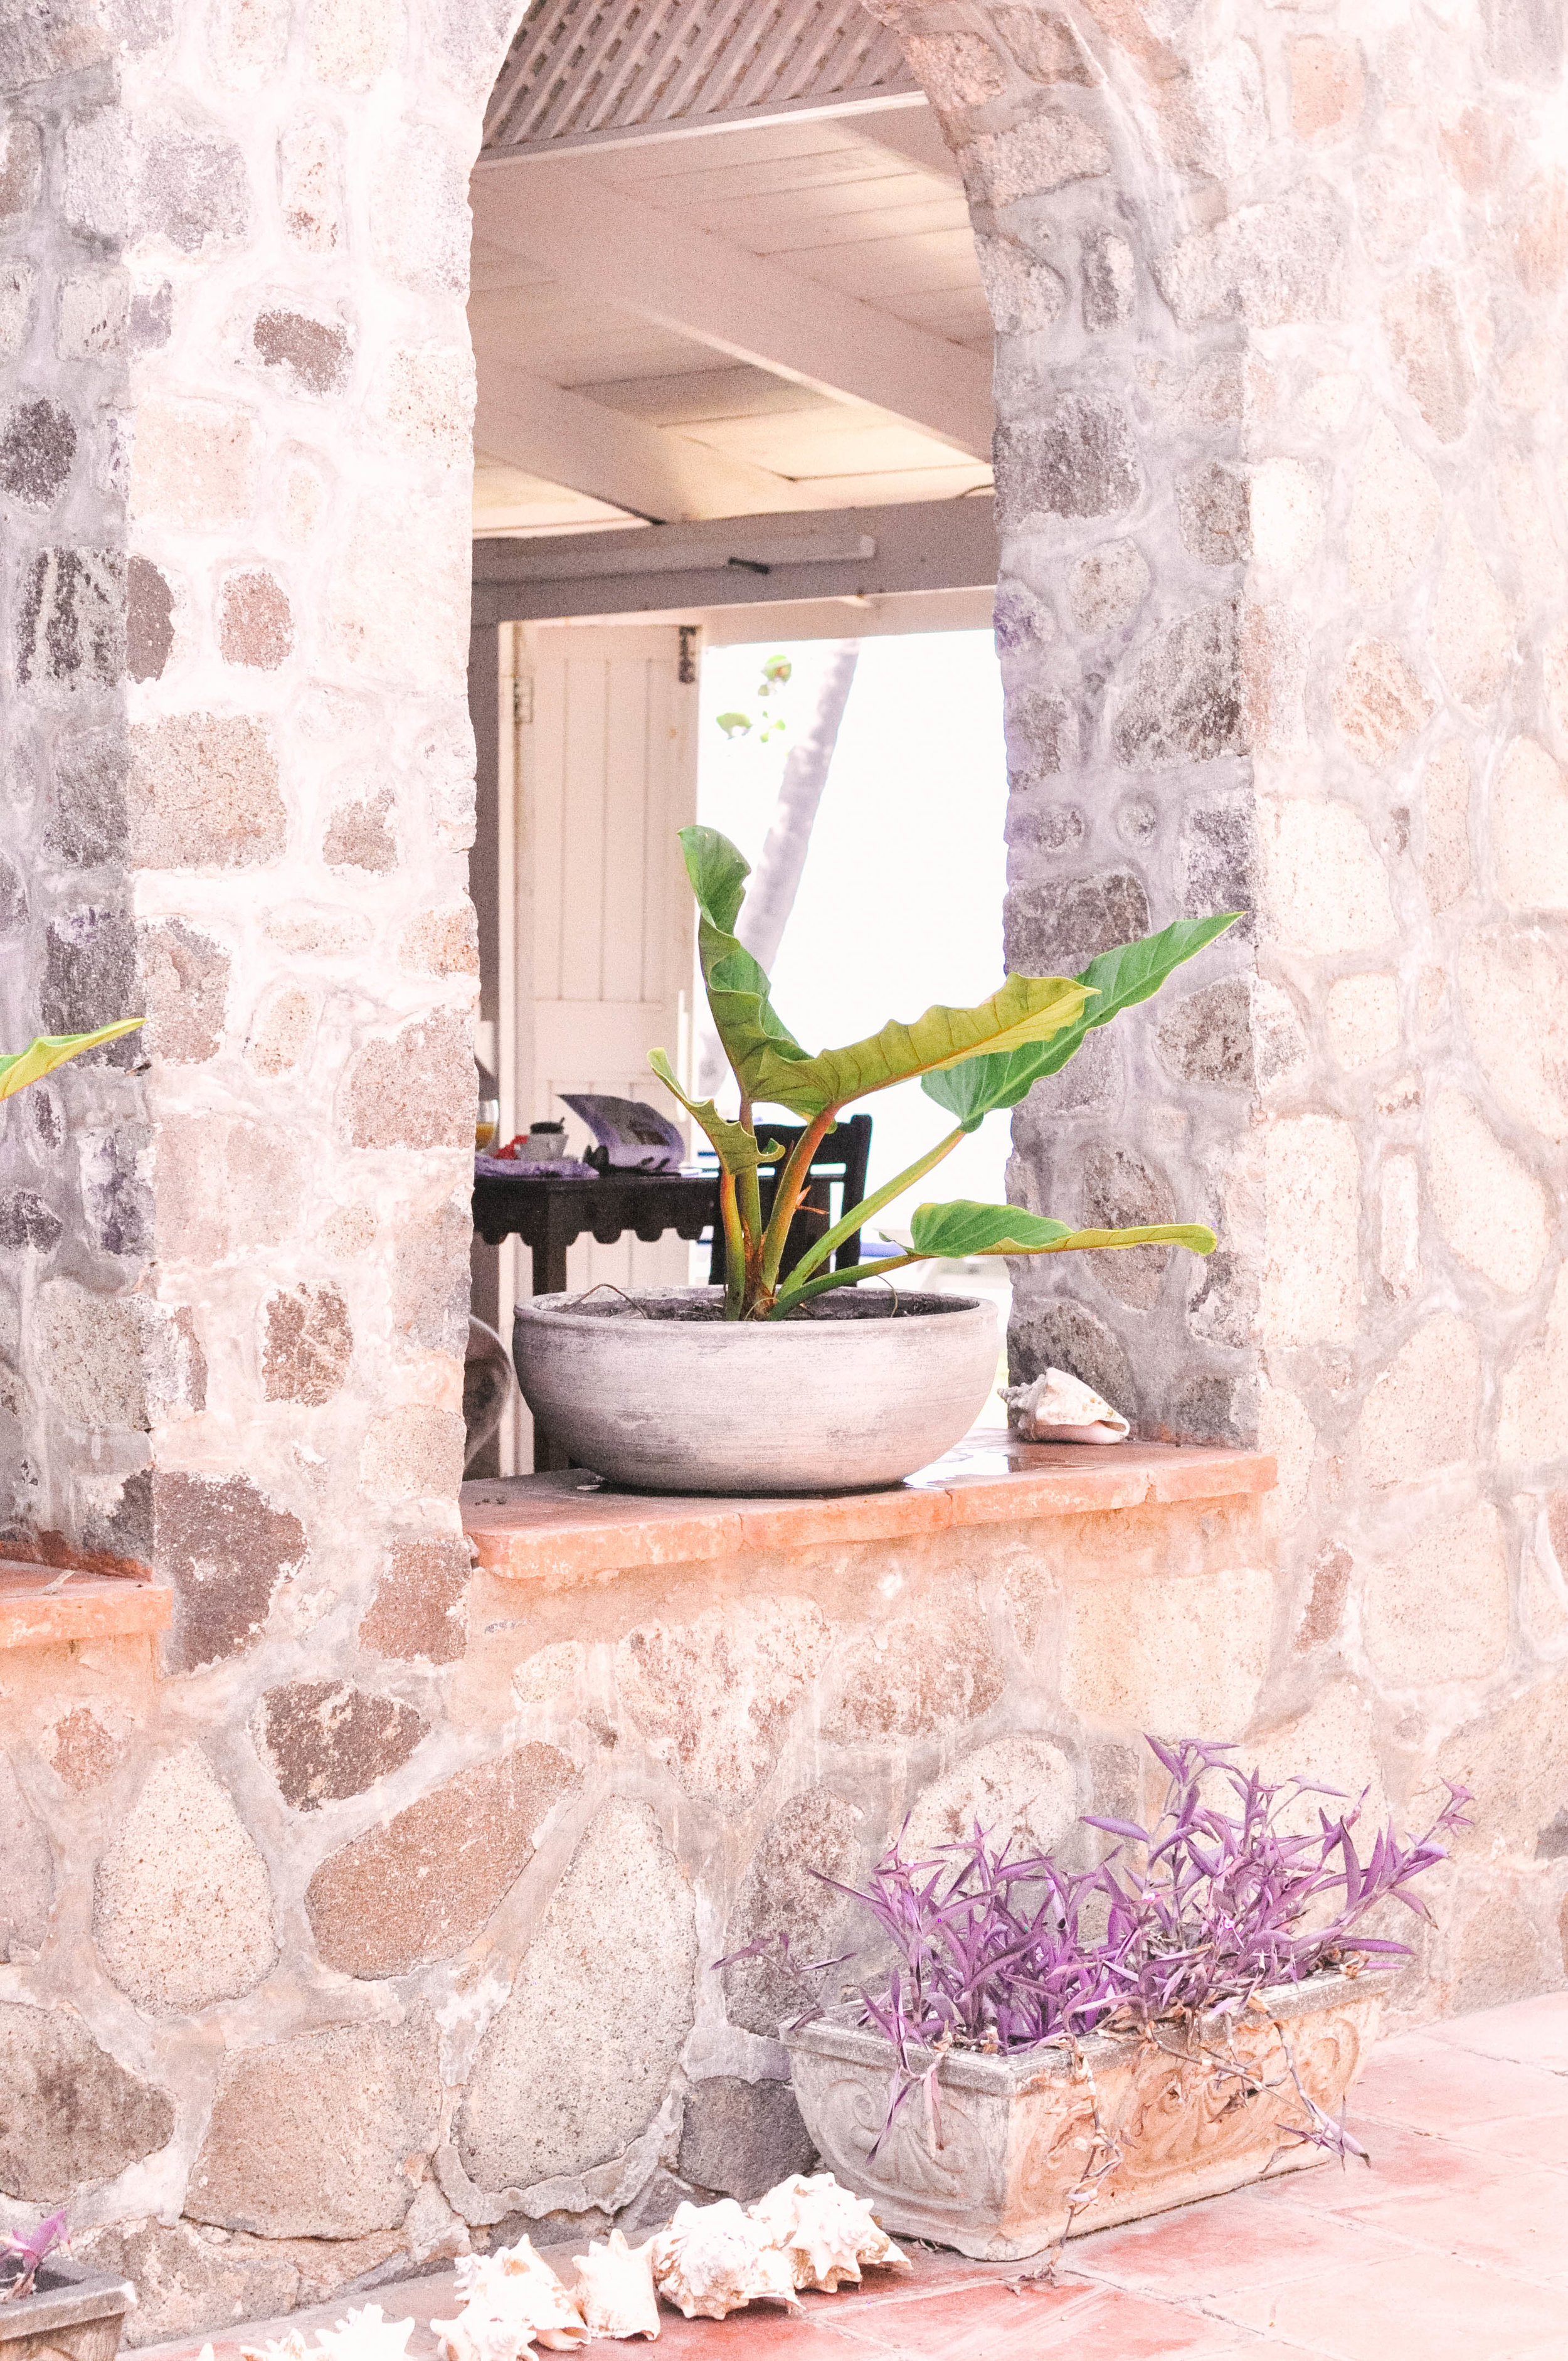 Green plant in stone window